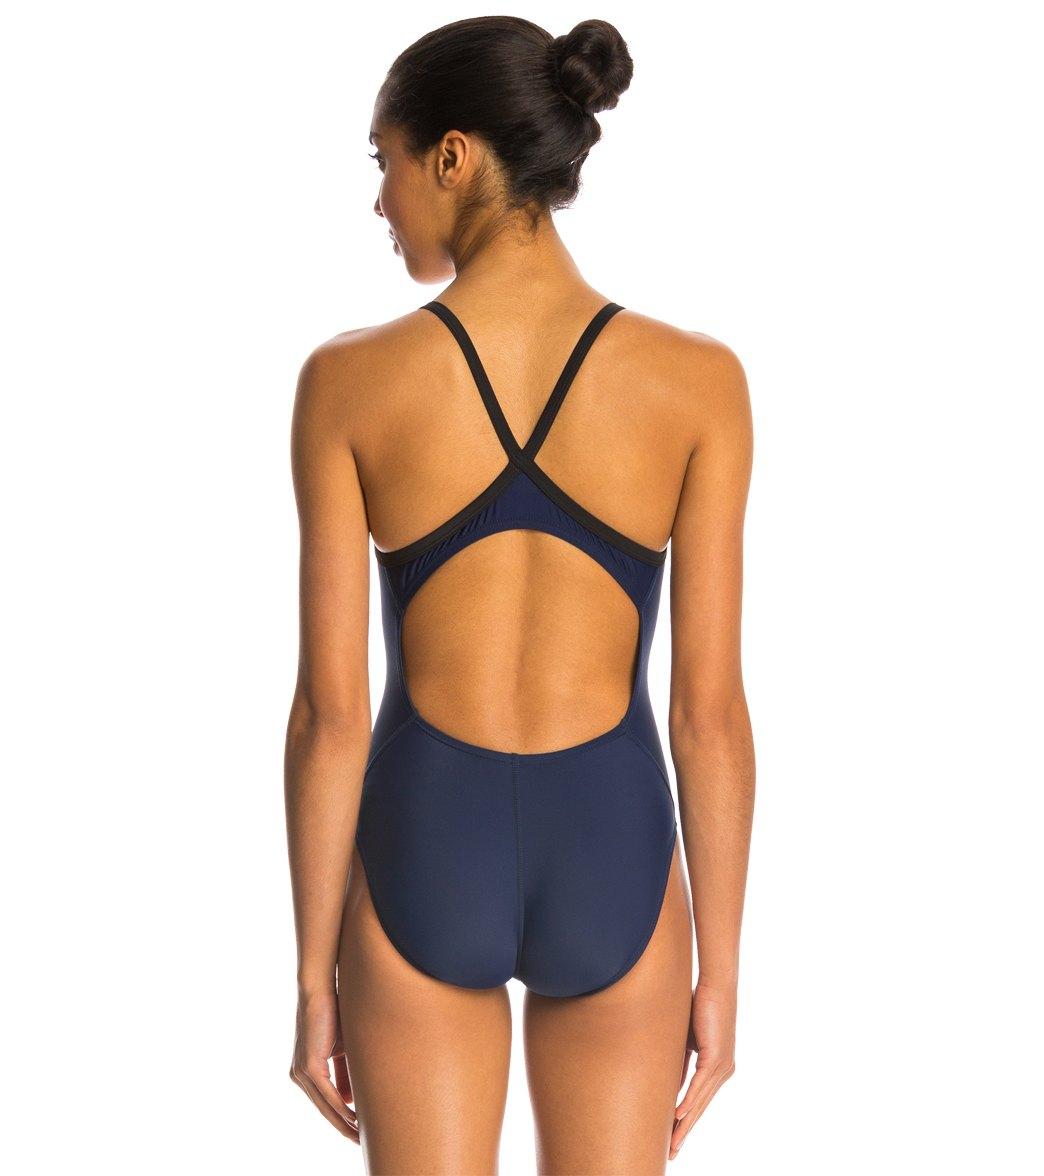 Nike Swim Nylon Core Solids Lingerie Tank One Piece Swimsuit Fast ...